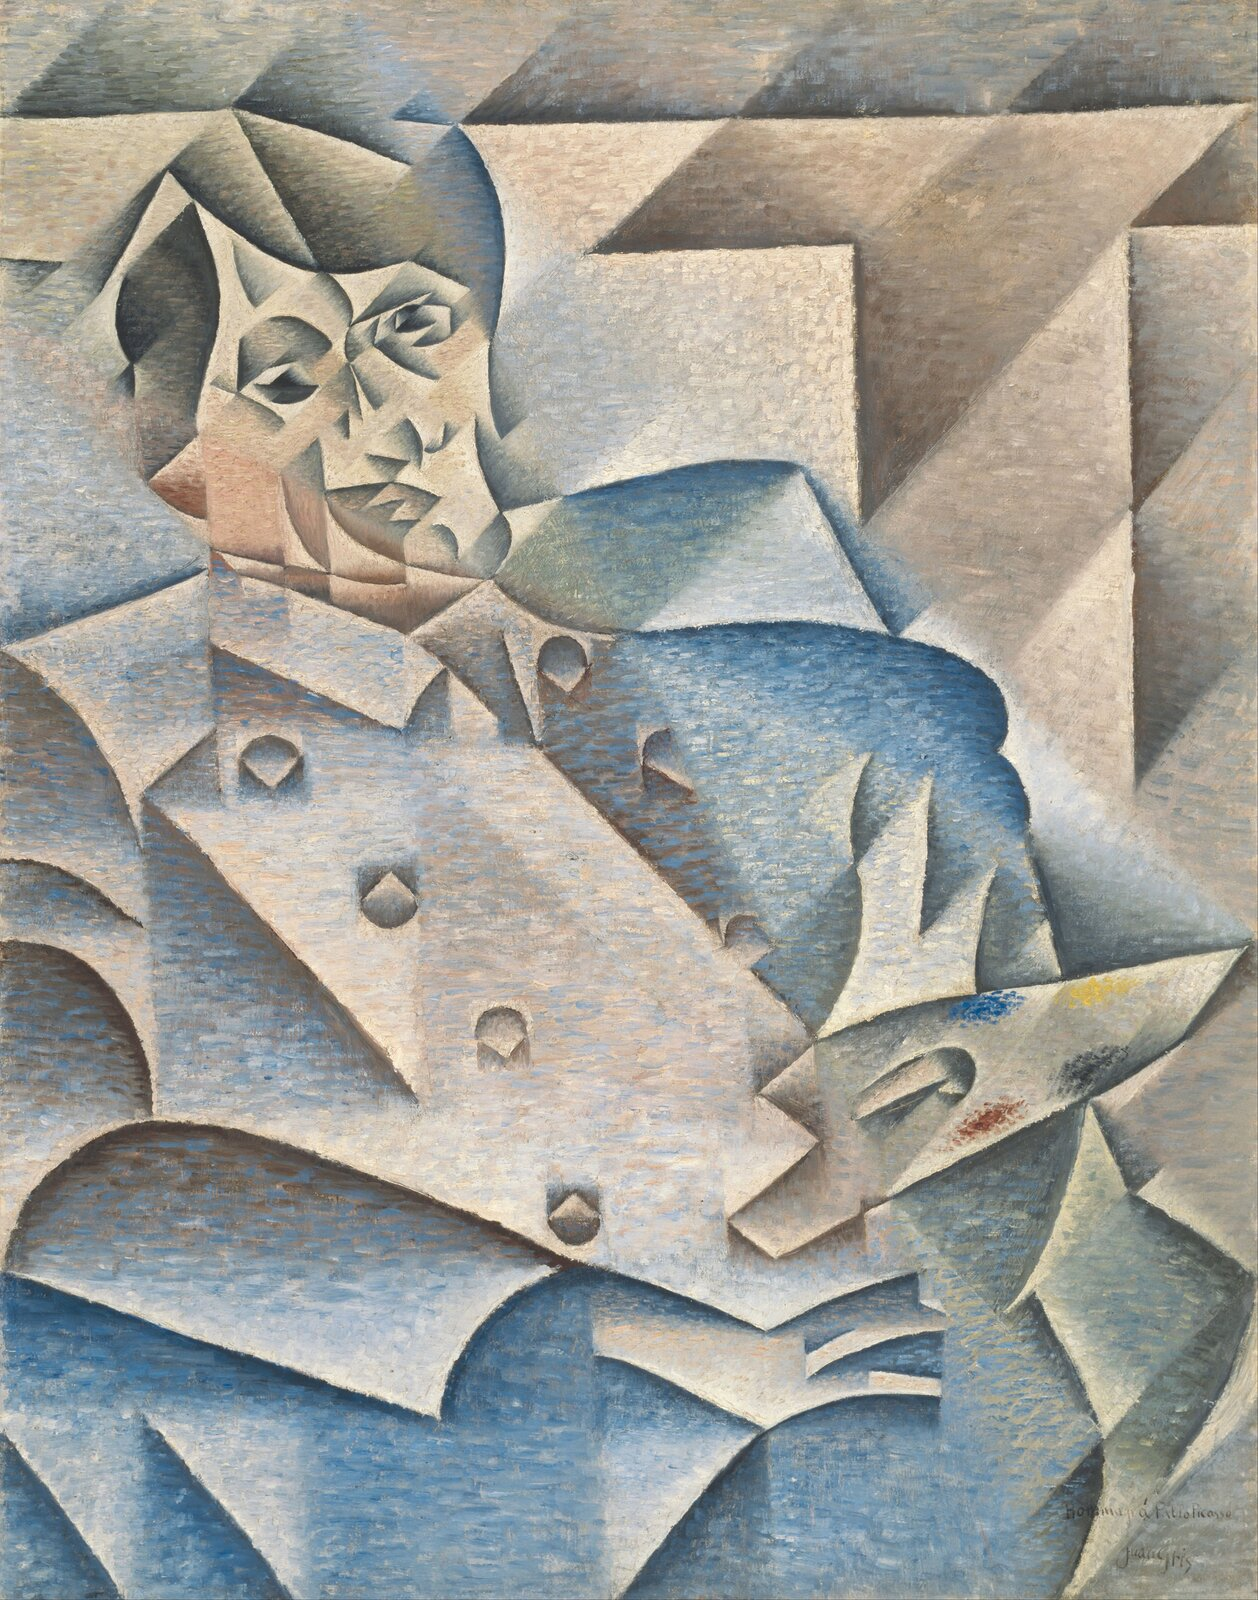 Portret Pabla Picassa Źródło: Juan Gris, Portret Pabla Picassa, 1912, olej na płótnie, Art Institute of Chicago, Chicago, domena publiczna.